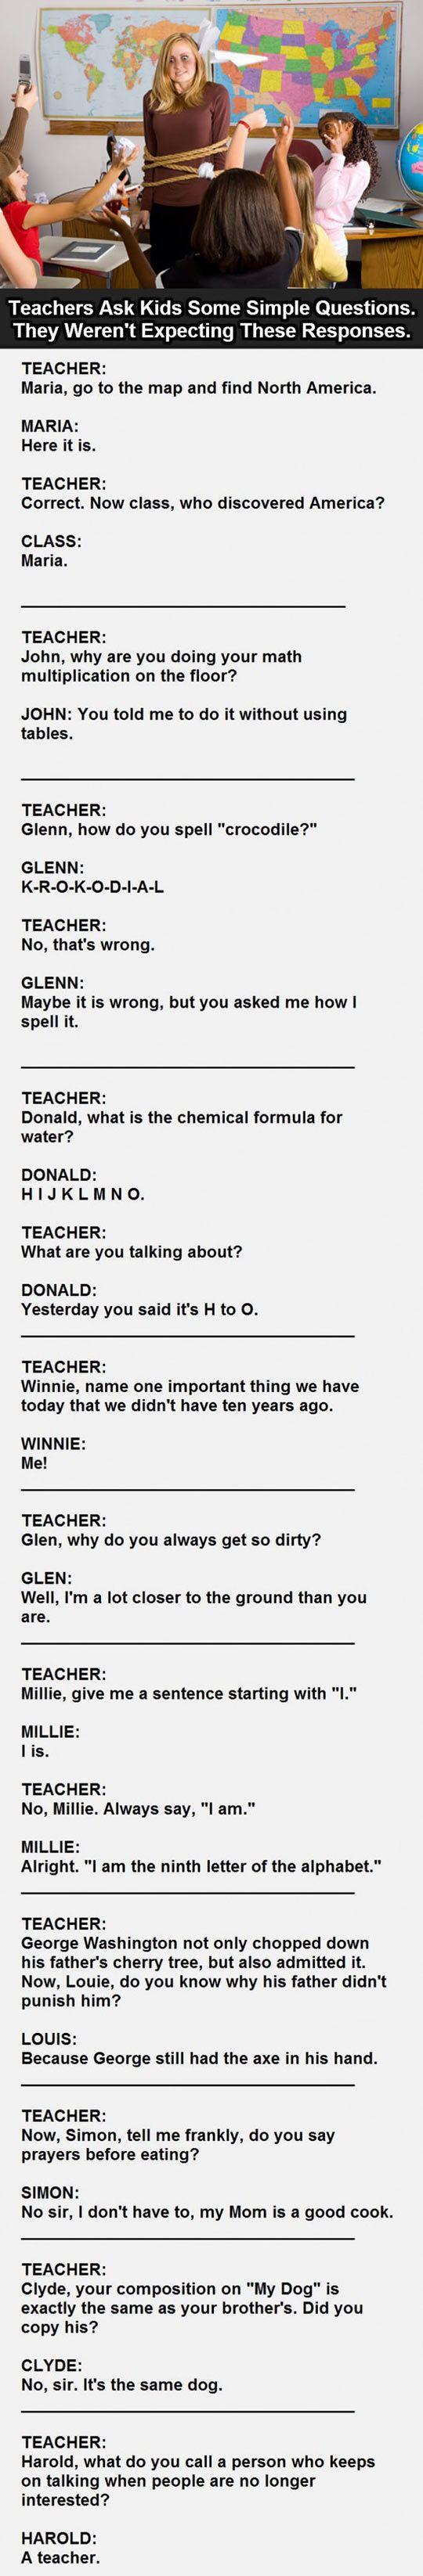 Kids Have The Best Comebacks Comebacks Humor And Random - The 10 most hilarious teacher comebacks of all times